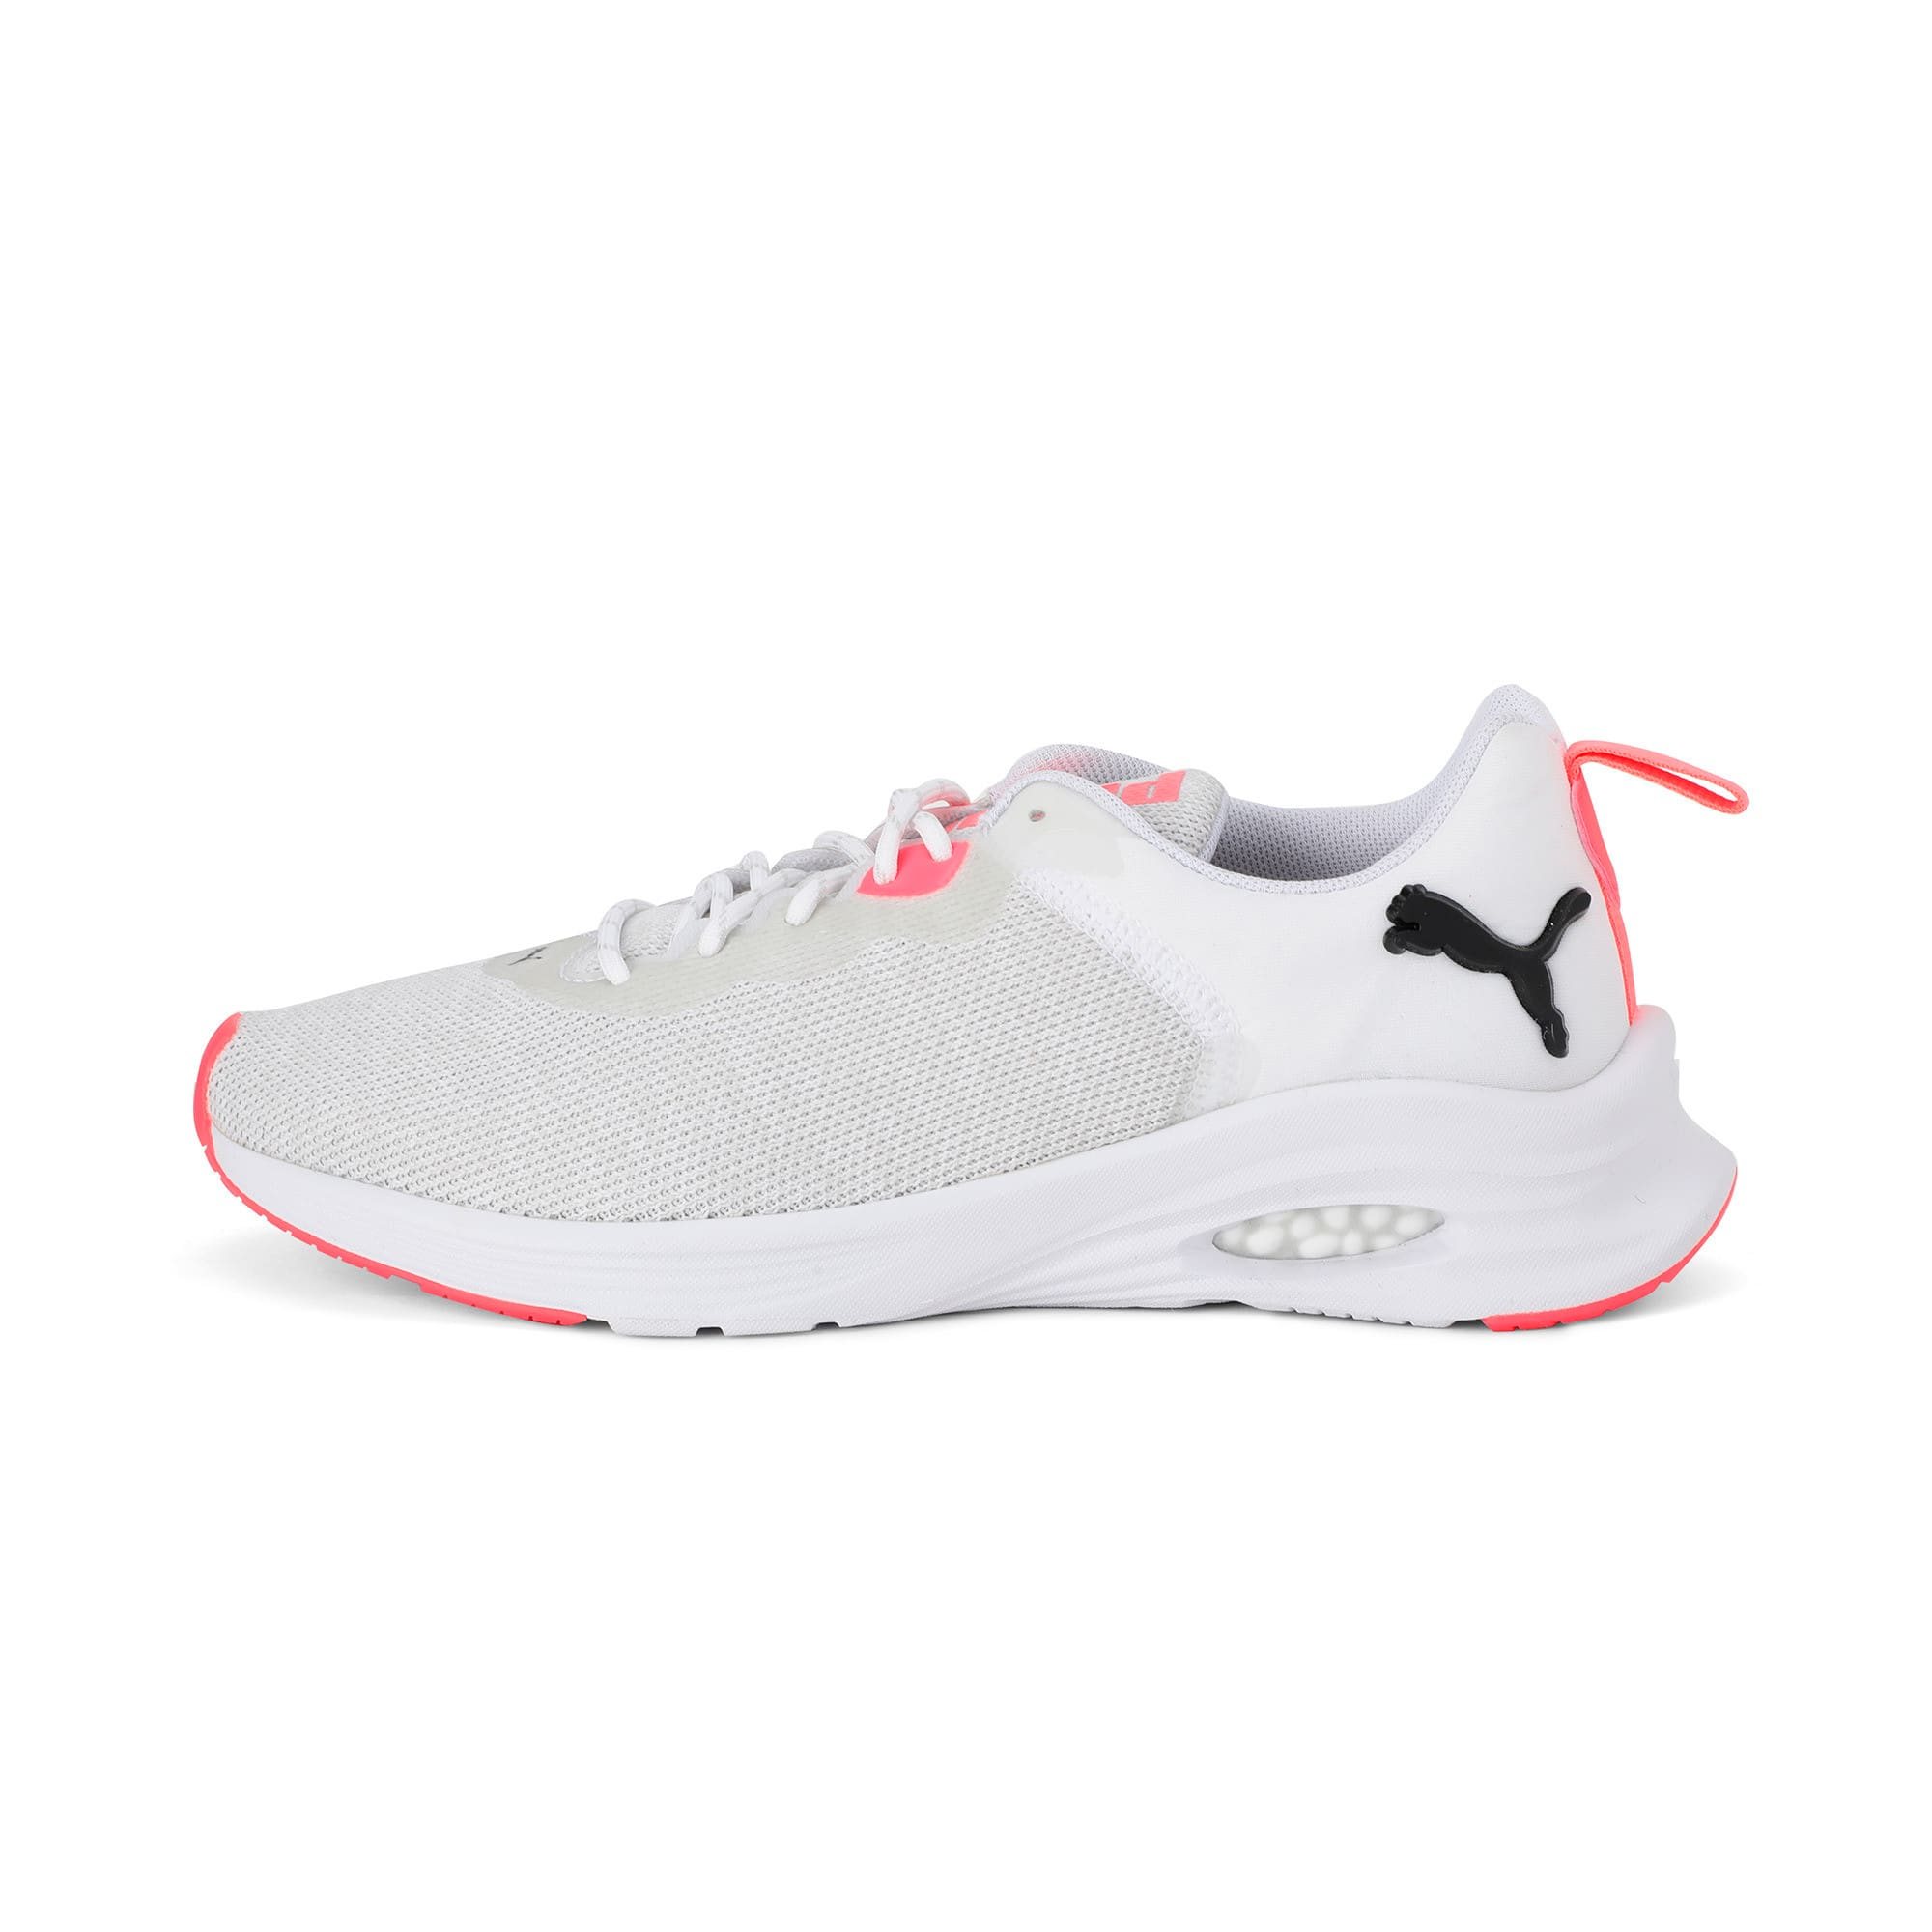 Thumbnail 1 of HYBRID Fuego Knit Women's Running Shoes, Puma White-Pnk Alert-Pma Blk, medium-IND